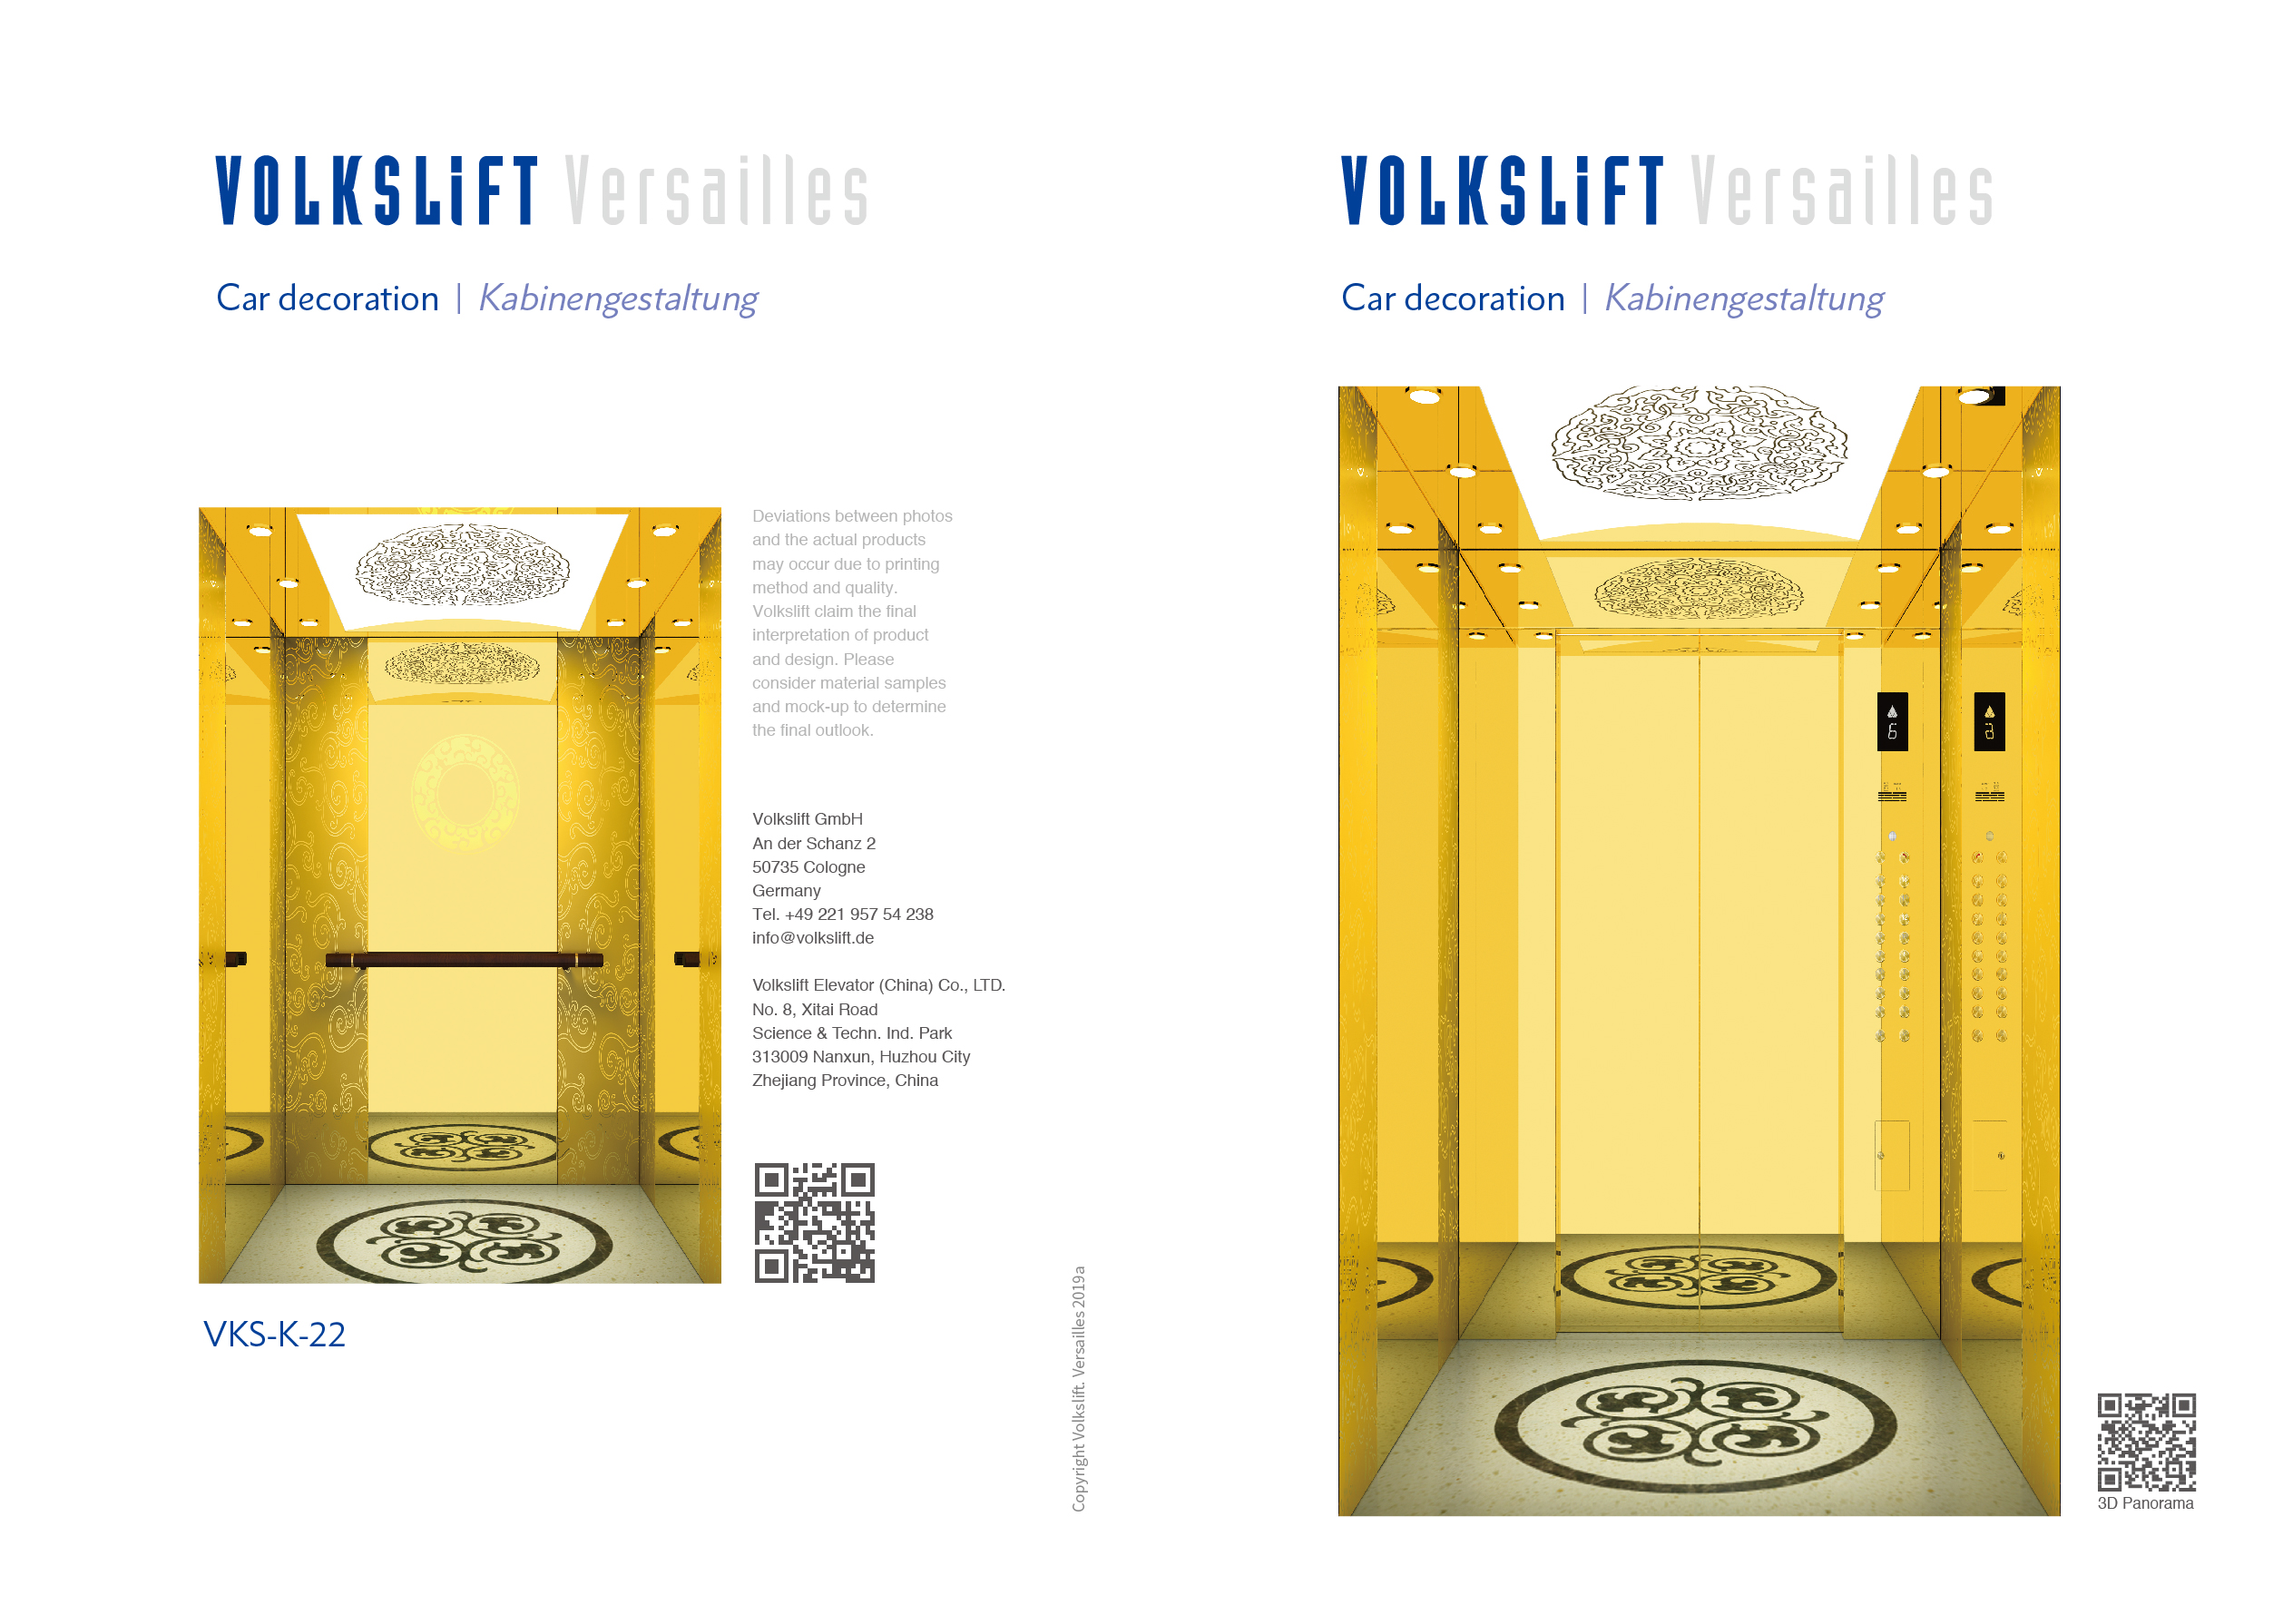 Versailles Elevator Design - Oryx Elevator